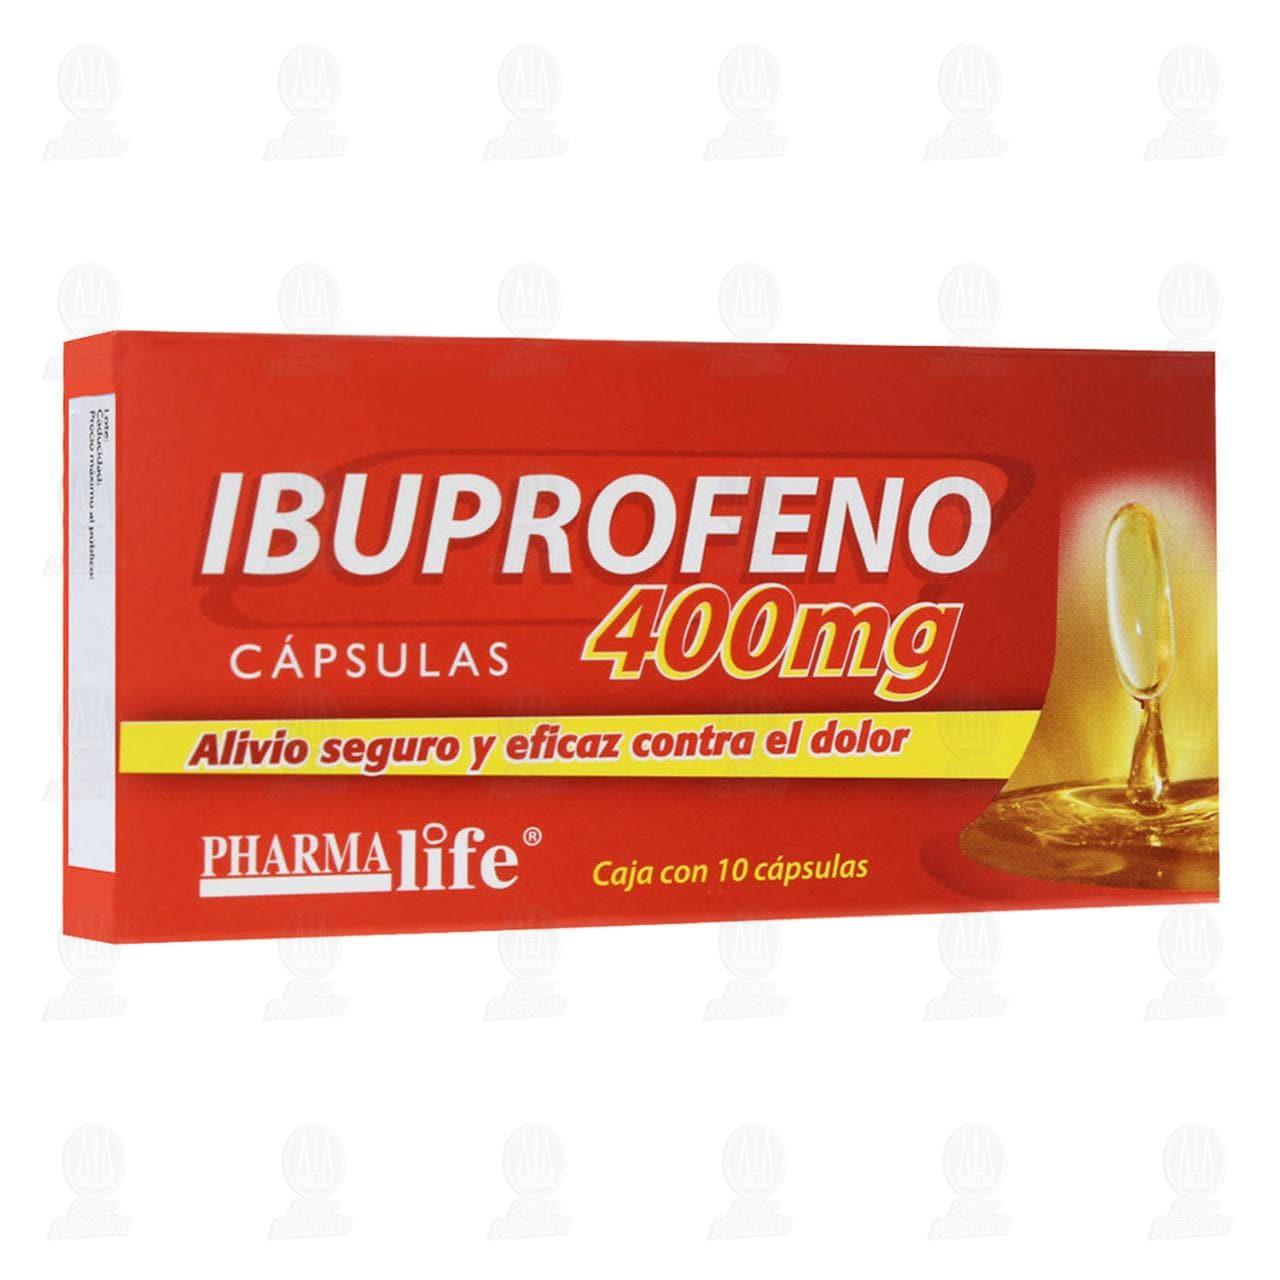 Comprar Ibuprofeno 400mg 10 Cápsulas Pharmalife en Farmacias Guadalajara